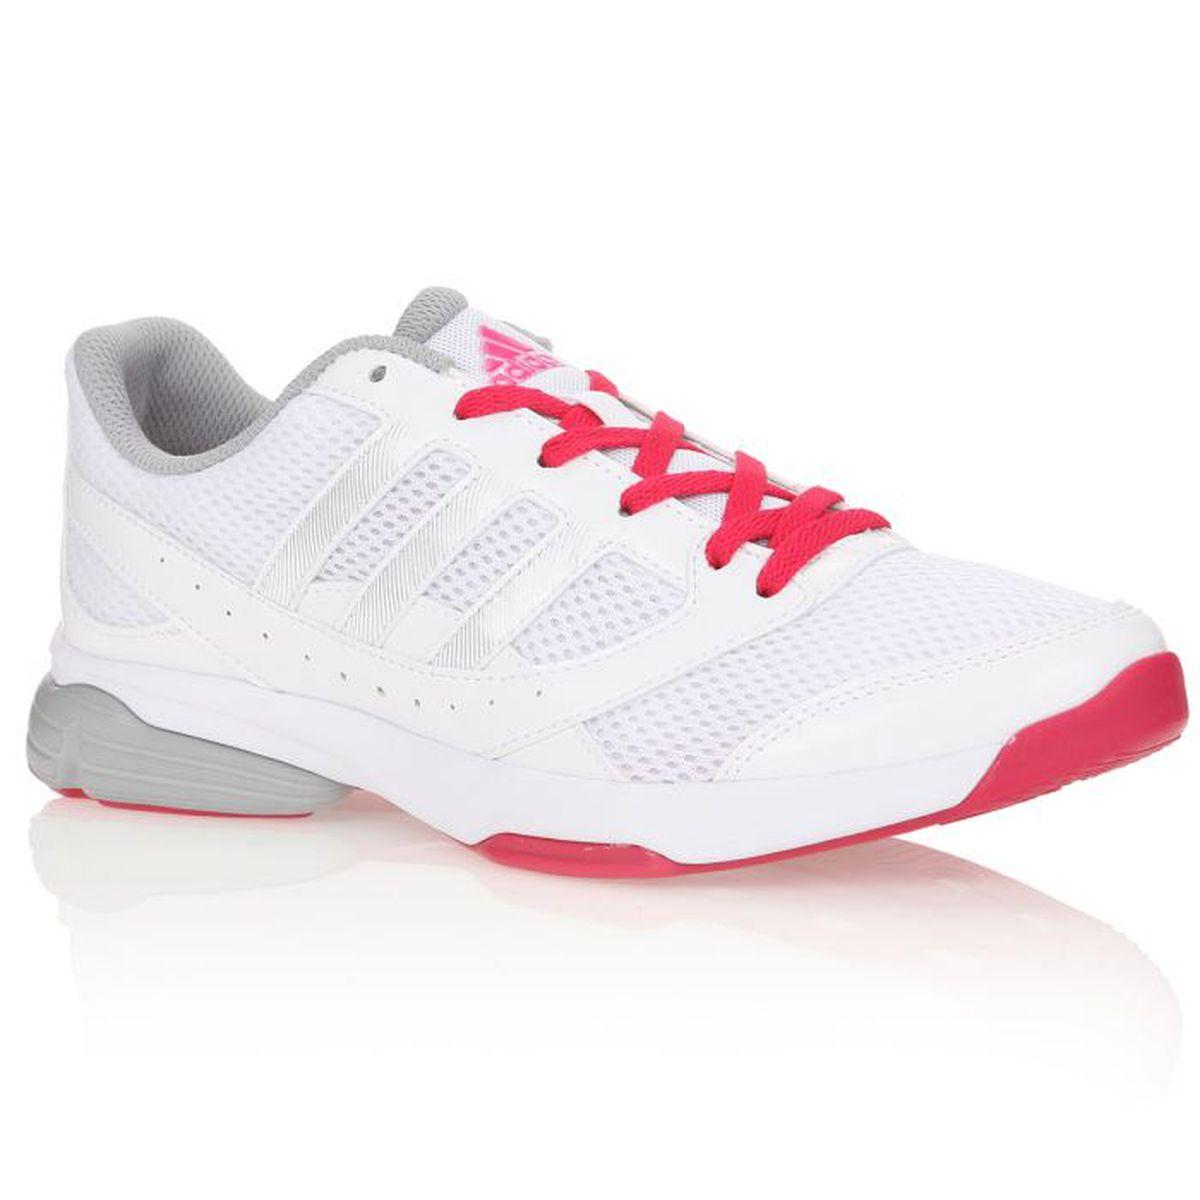 Adidas Achat Ii Sportswear Chaussures Arianna Femme qSUzVGpM